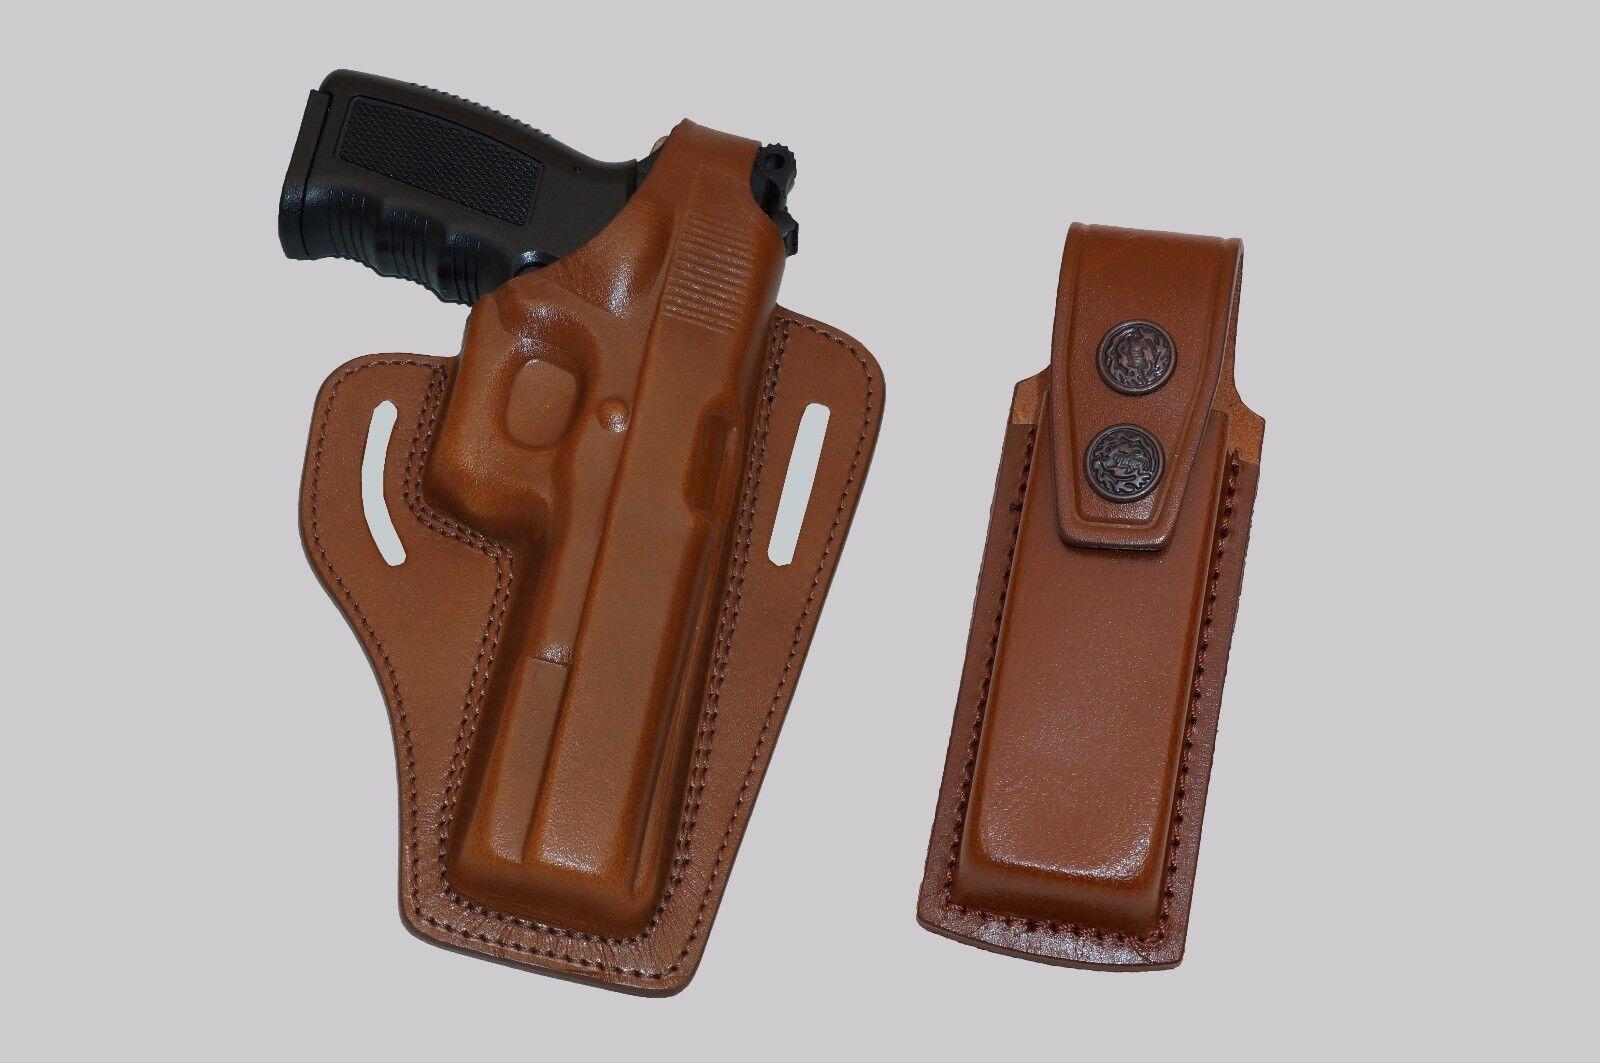 K34105 Pancake Leder Holster Thumb Break RH & Single Mag Case Sig Sauer P226